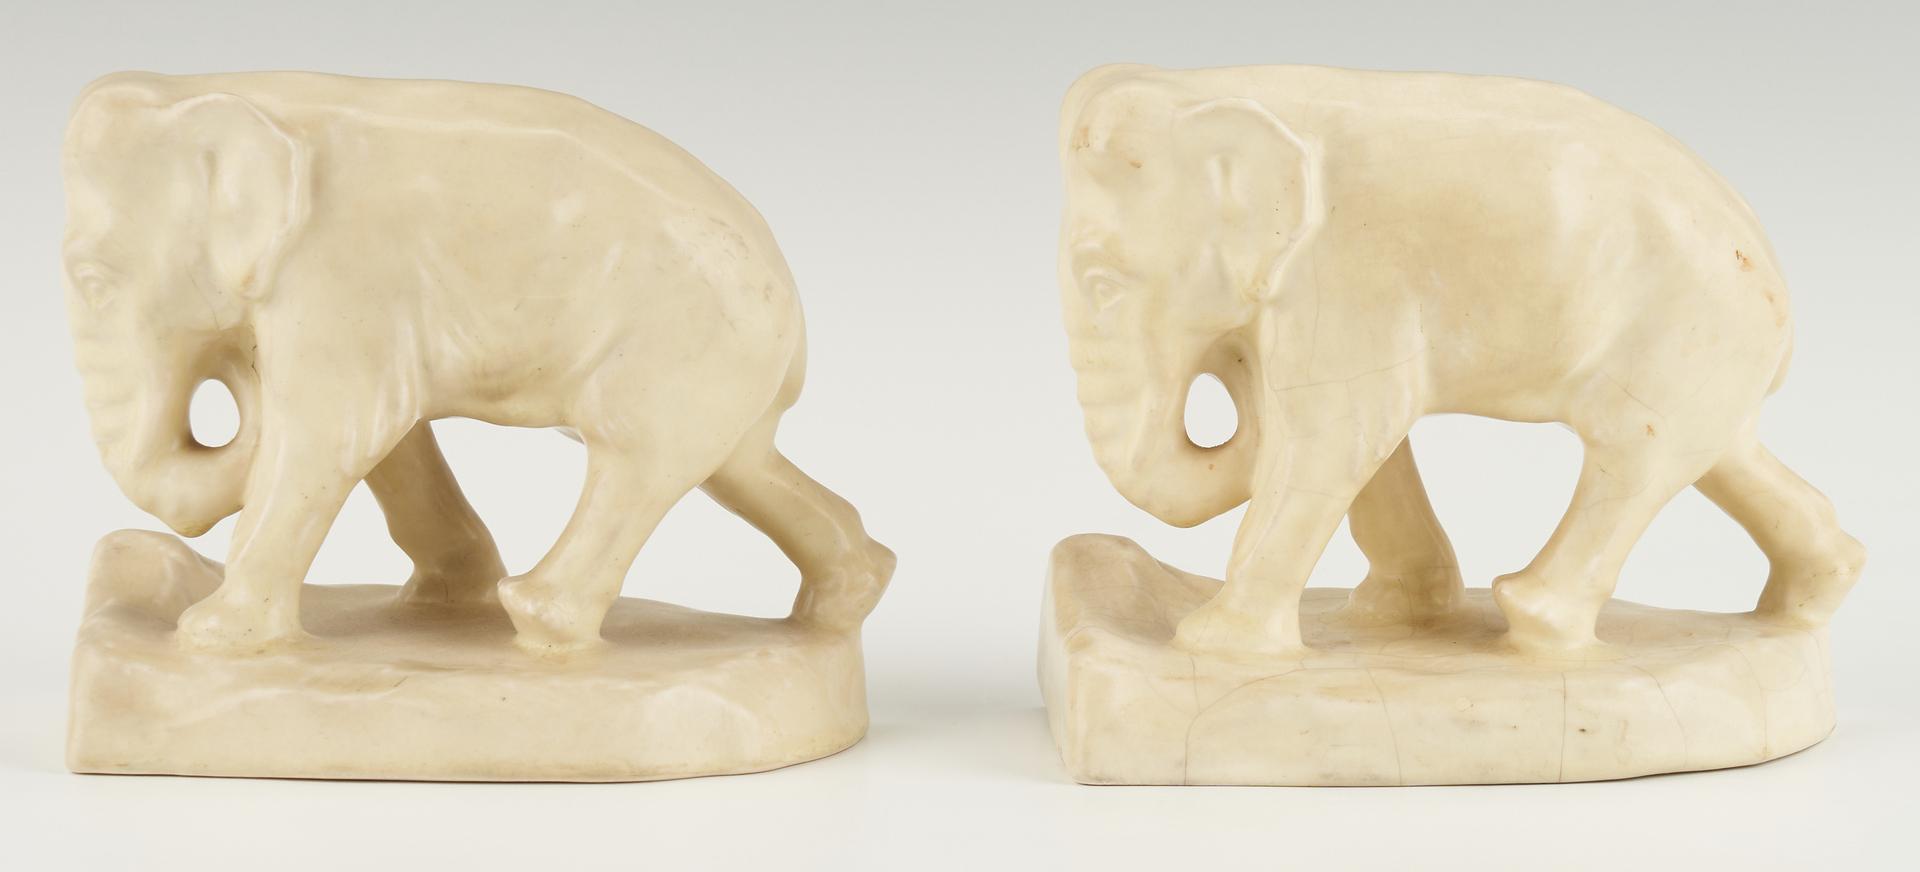 Lot 536: 4 Pcs. Rookwood Art Pottery,  incl. Elephant Bookends